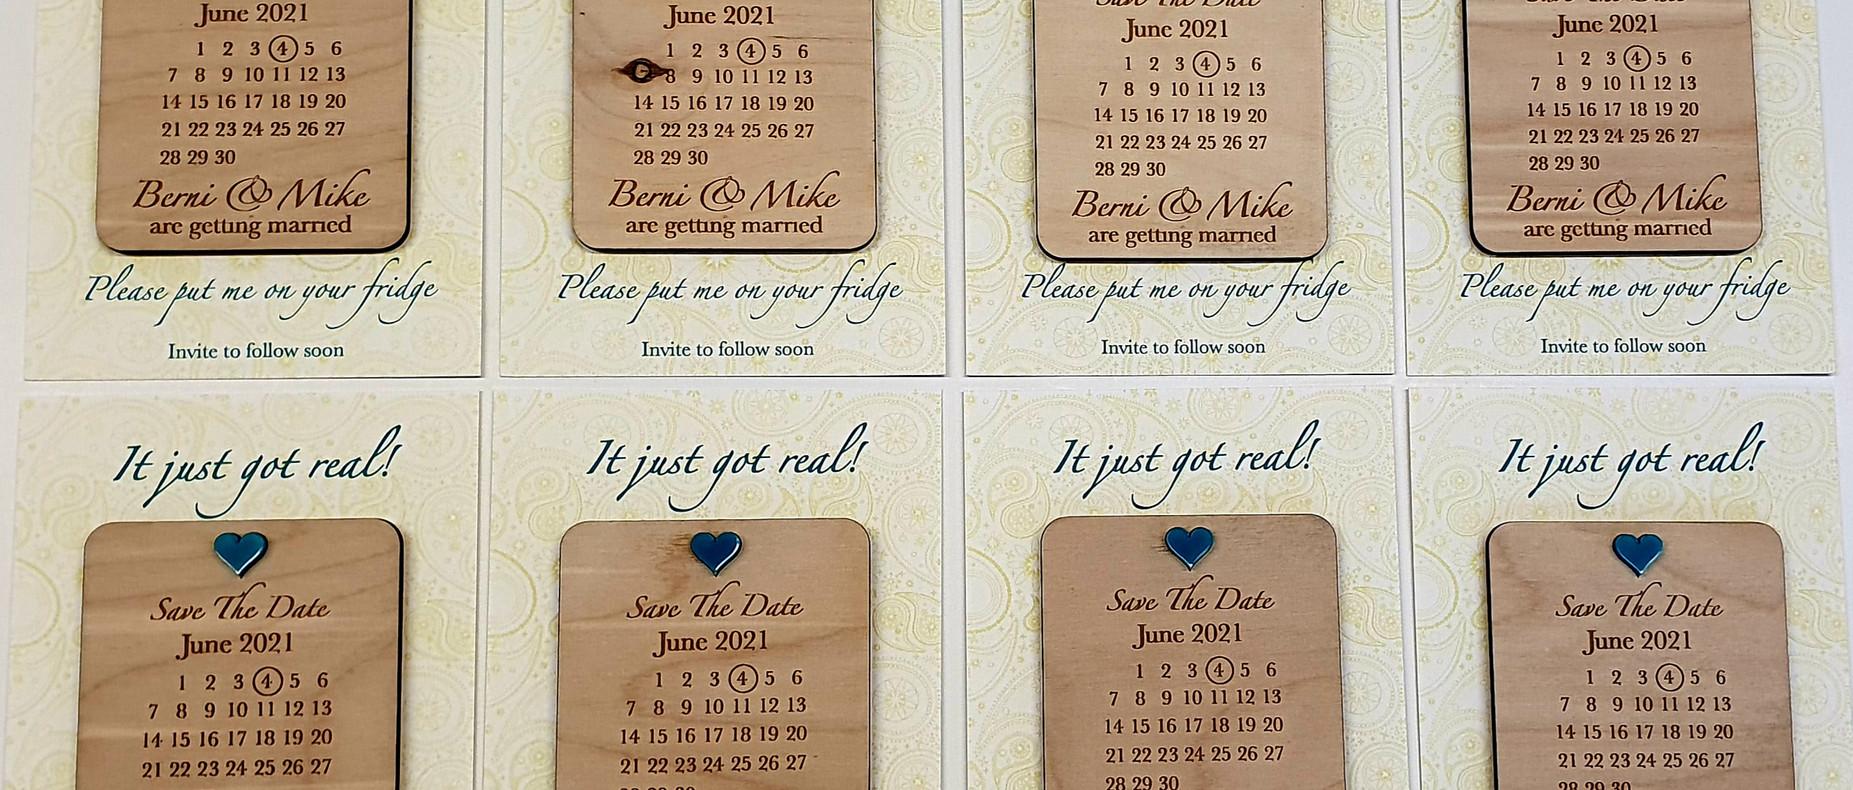 Berni & Mike's Save the Dates